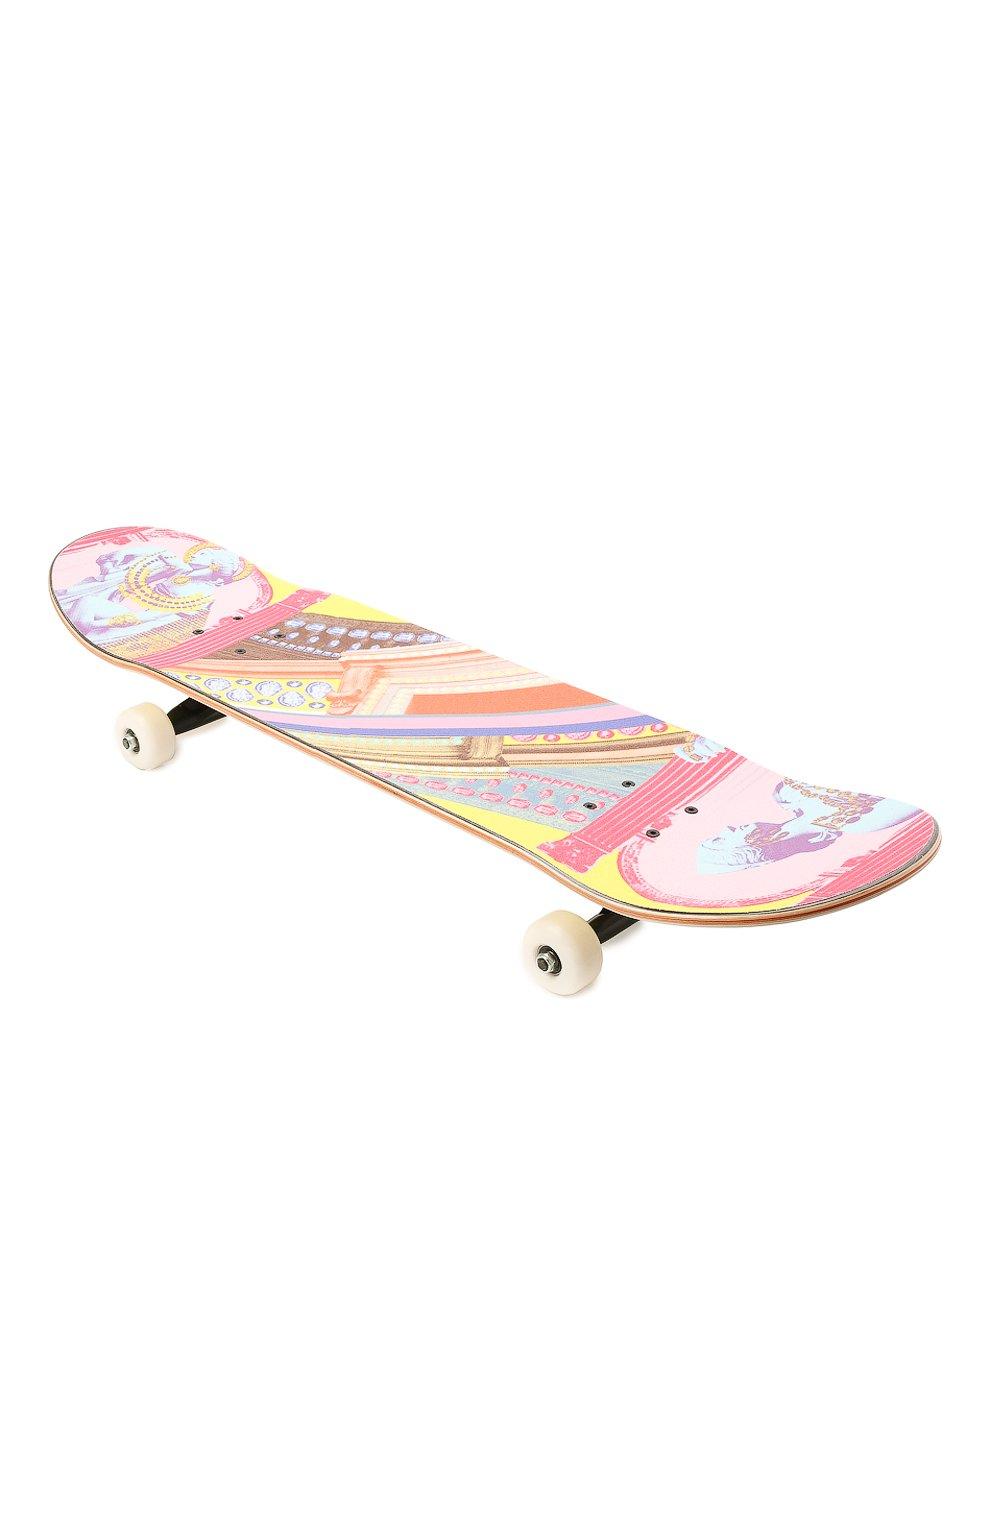 Детского скейтборд VERSACE разноцветного цвета, арт. ZSKATE001/ZW00D001 | Фото 2 (Материал: Дерево)